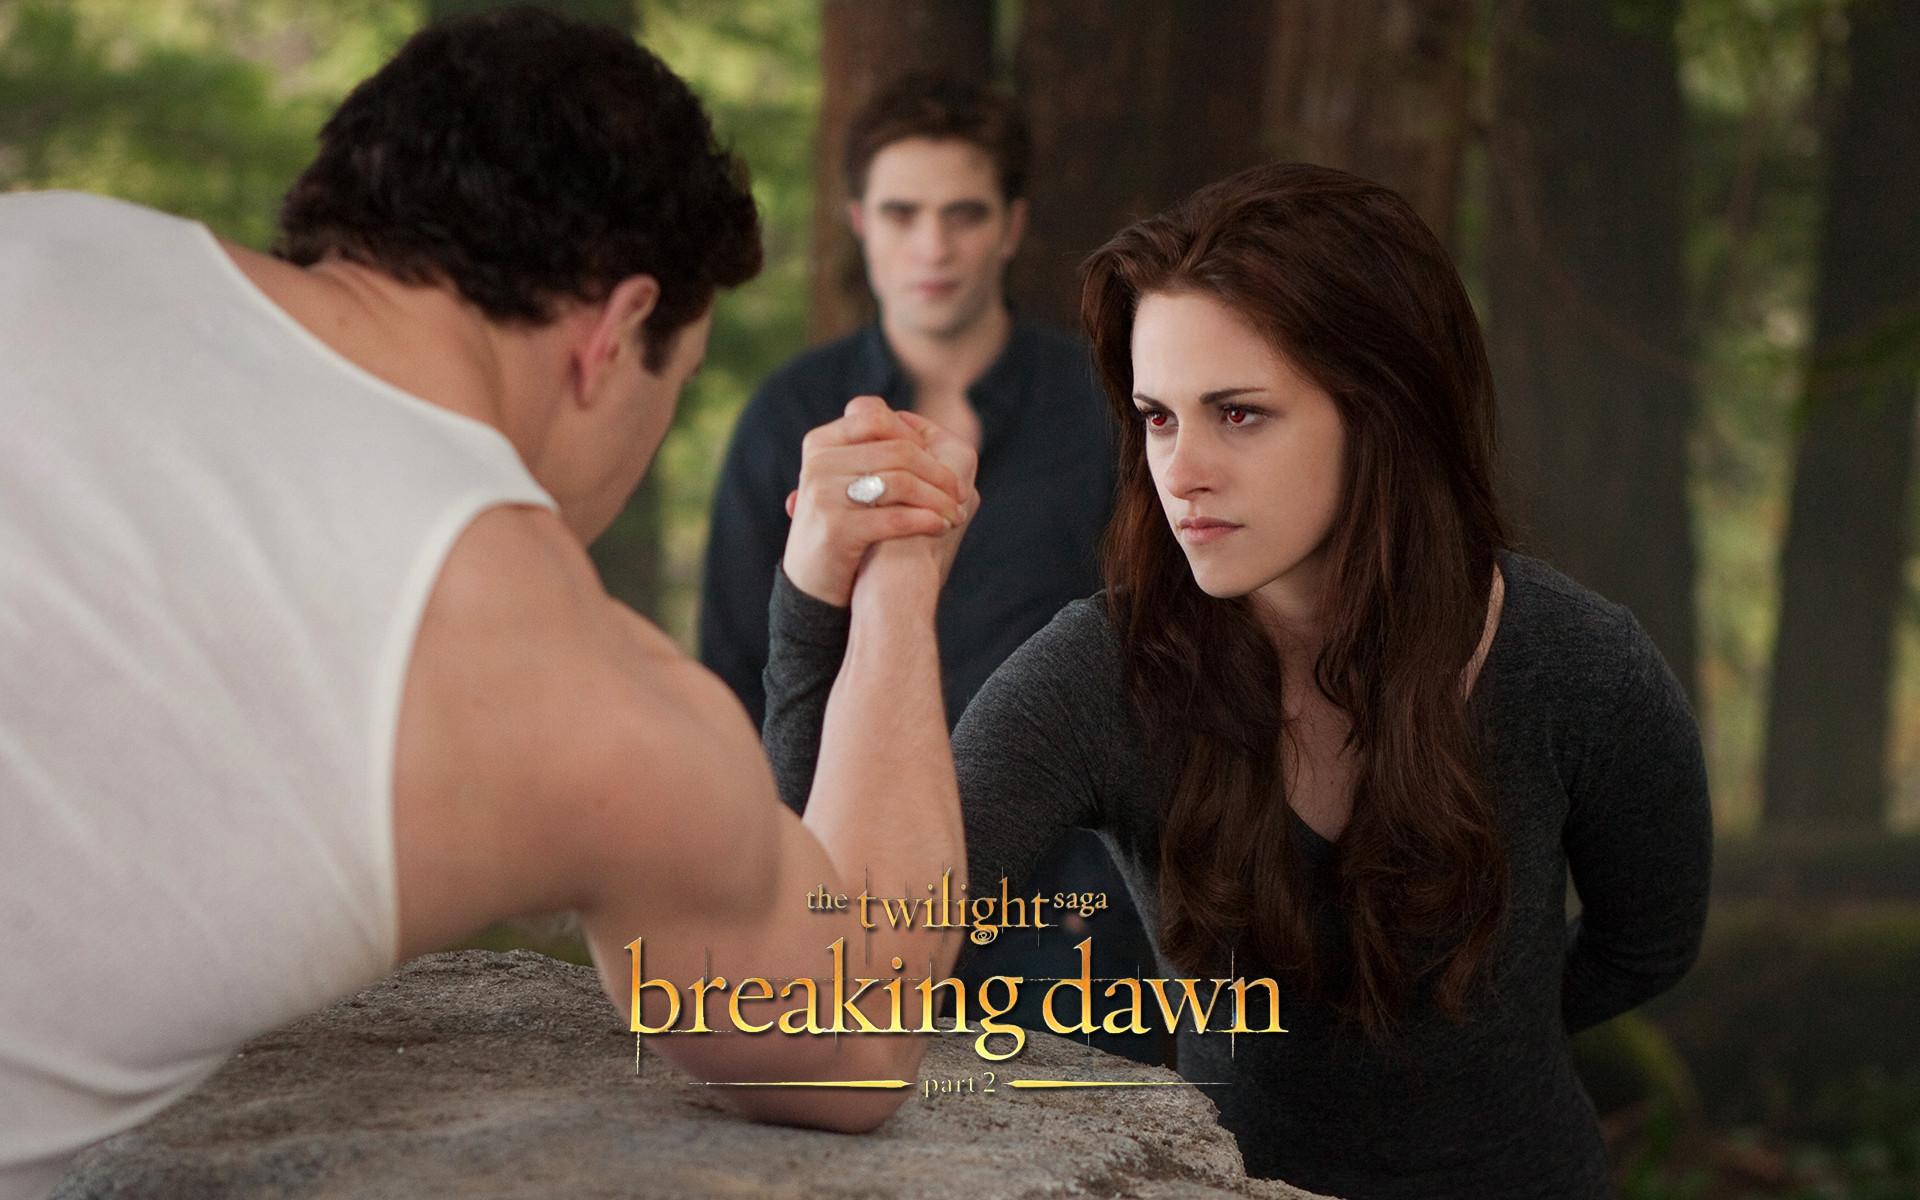 The Twilight Saga Twilight Saga Breaking Dawn Part 2 2012 1920x1200 Wallpaper Teahub Io